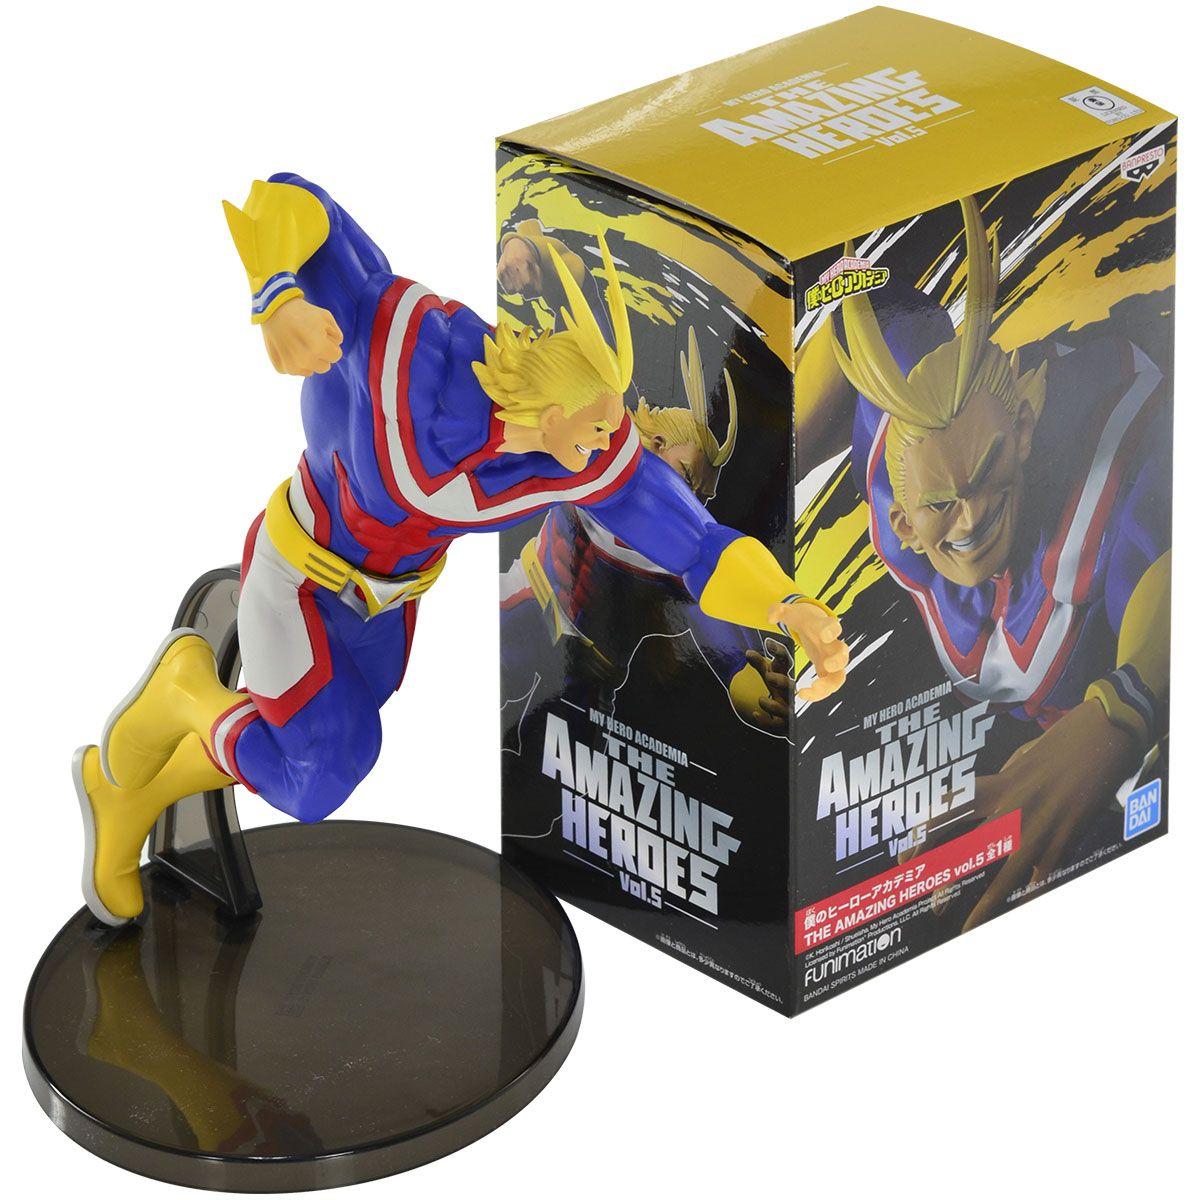 All Might - My Hero Academia - The Amazing Heroes Vol 5 - Bandai Banpresto